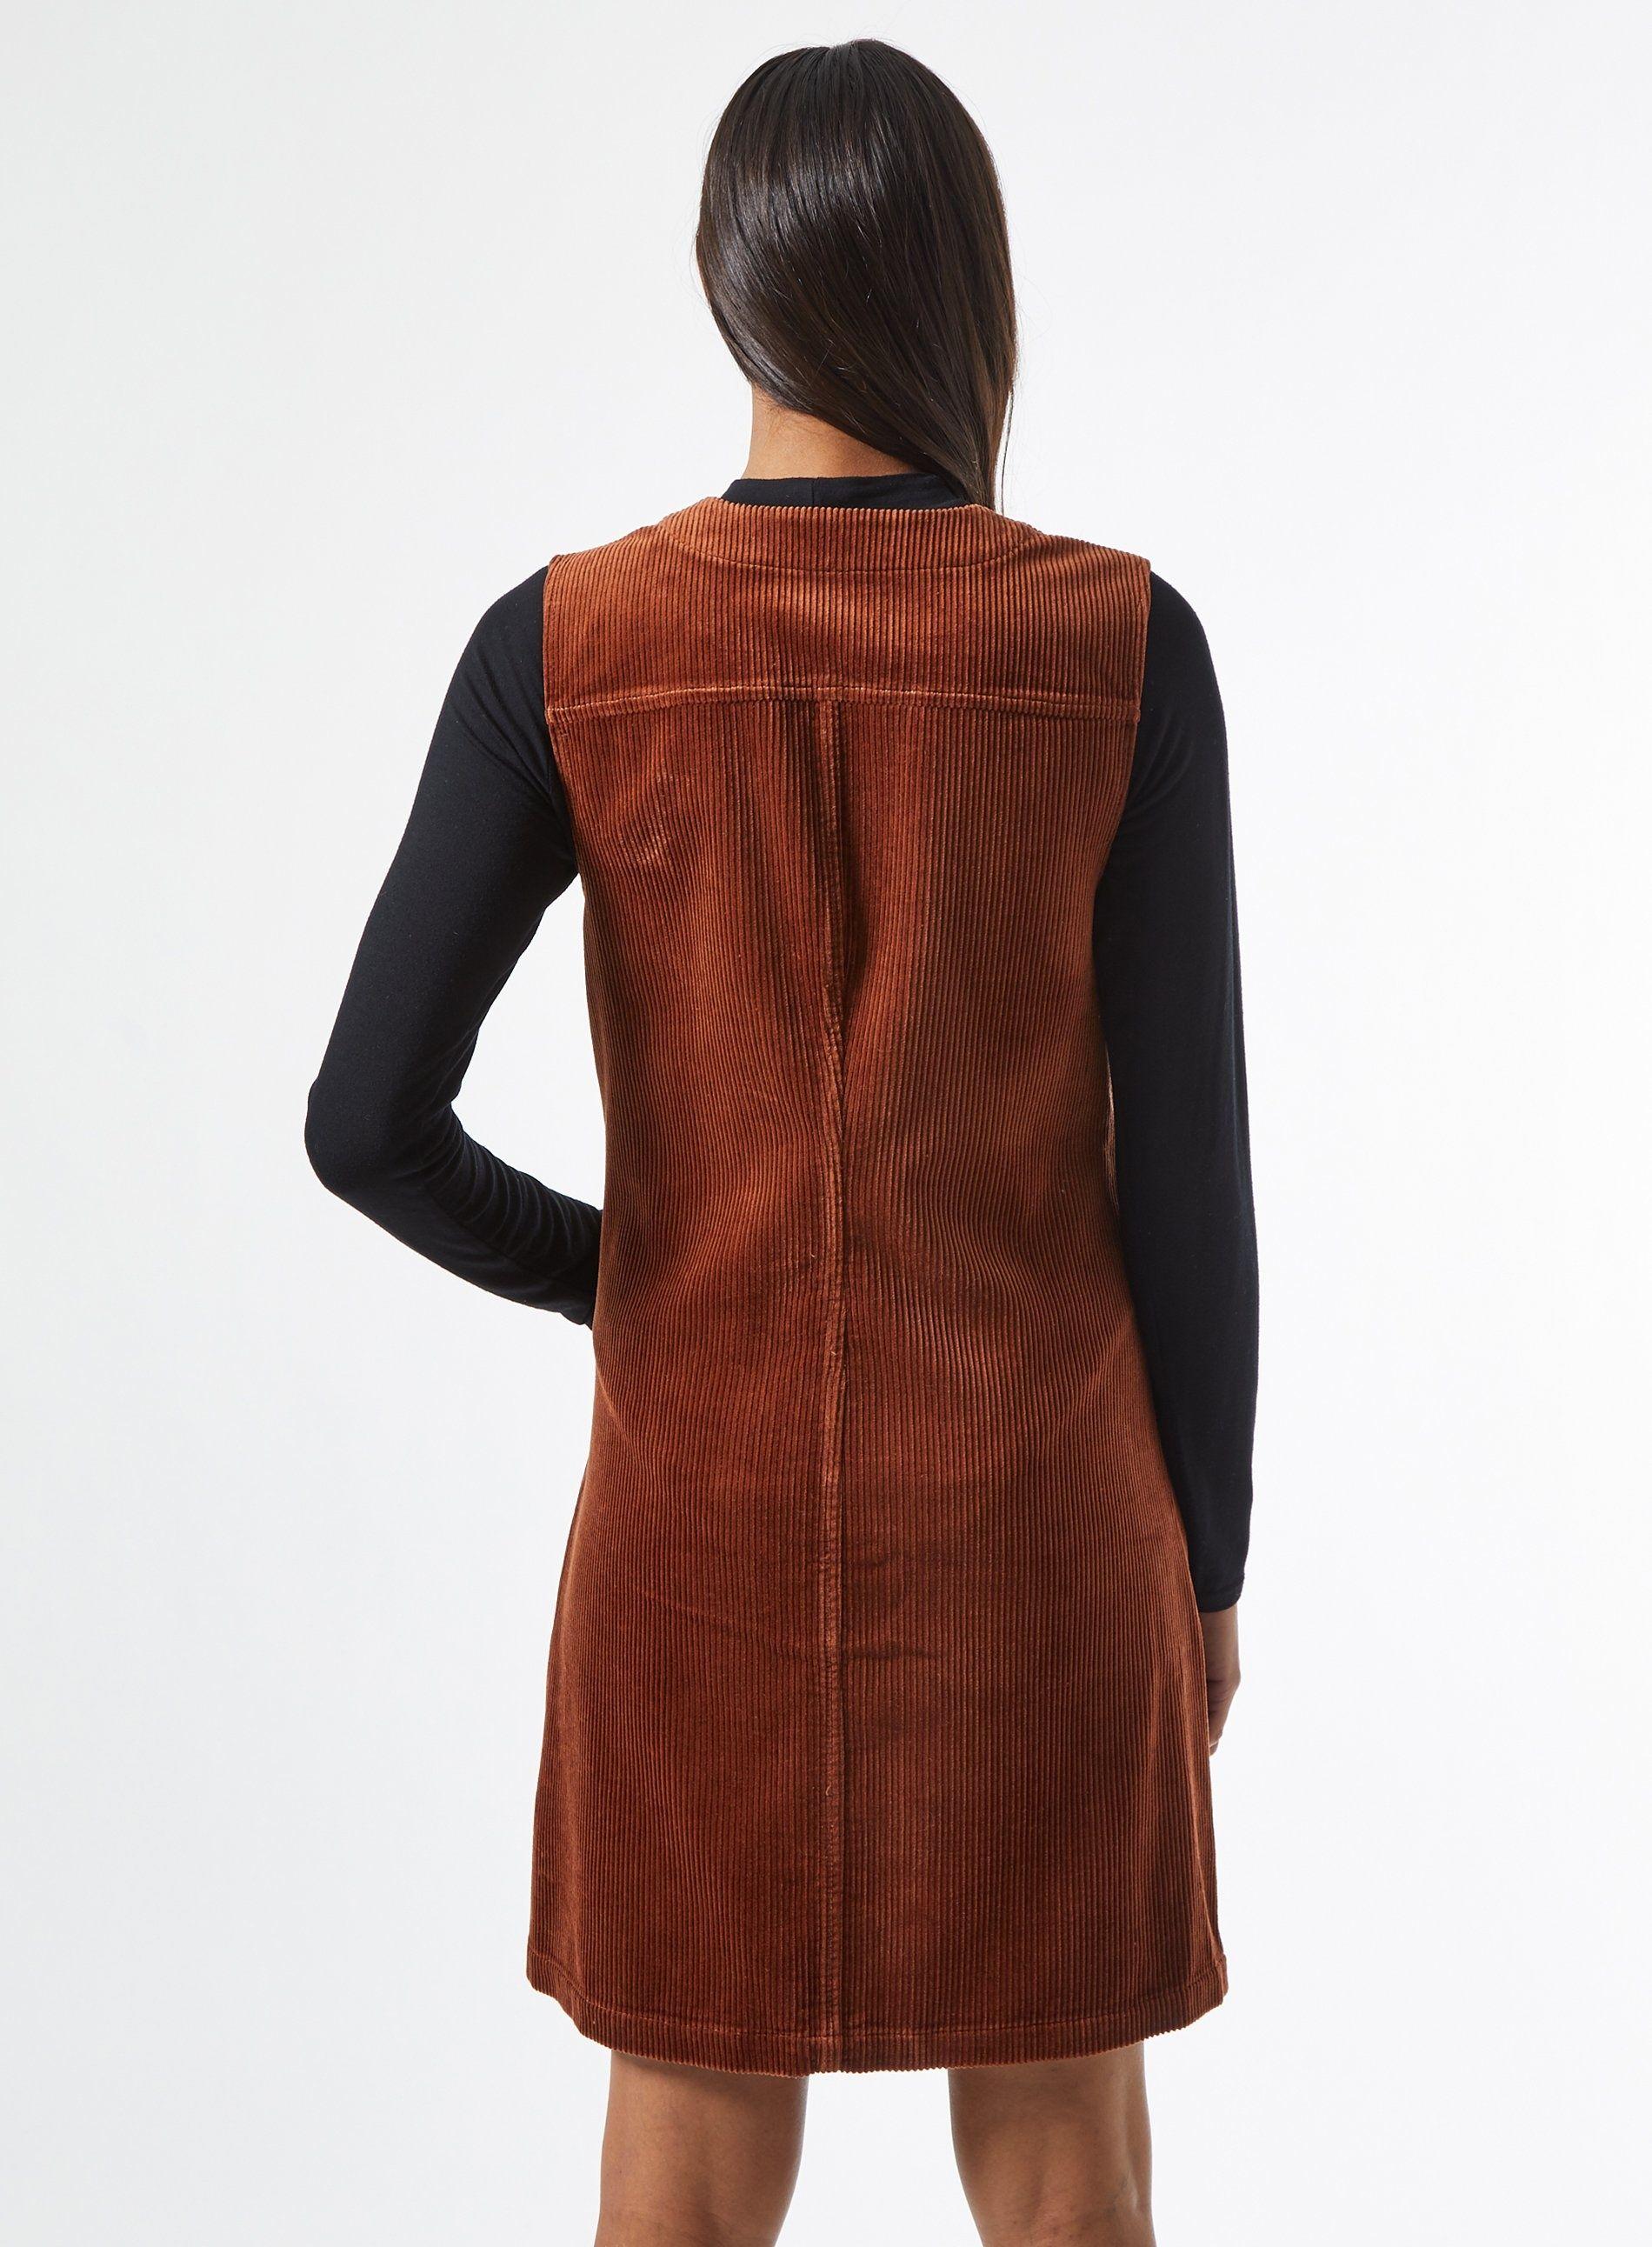 Dorothy Perkins Womens Brown Corduroy Pinafore Dress Sleeveless V-Neck